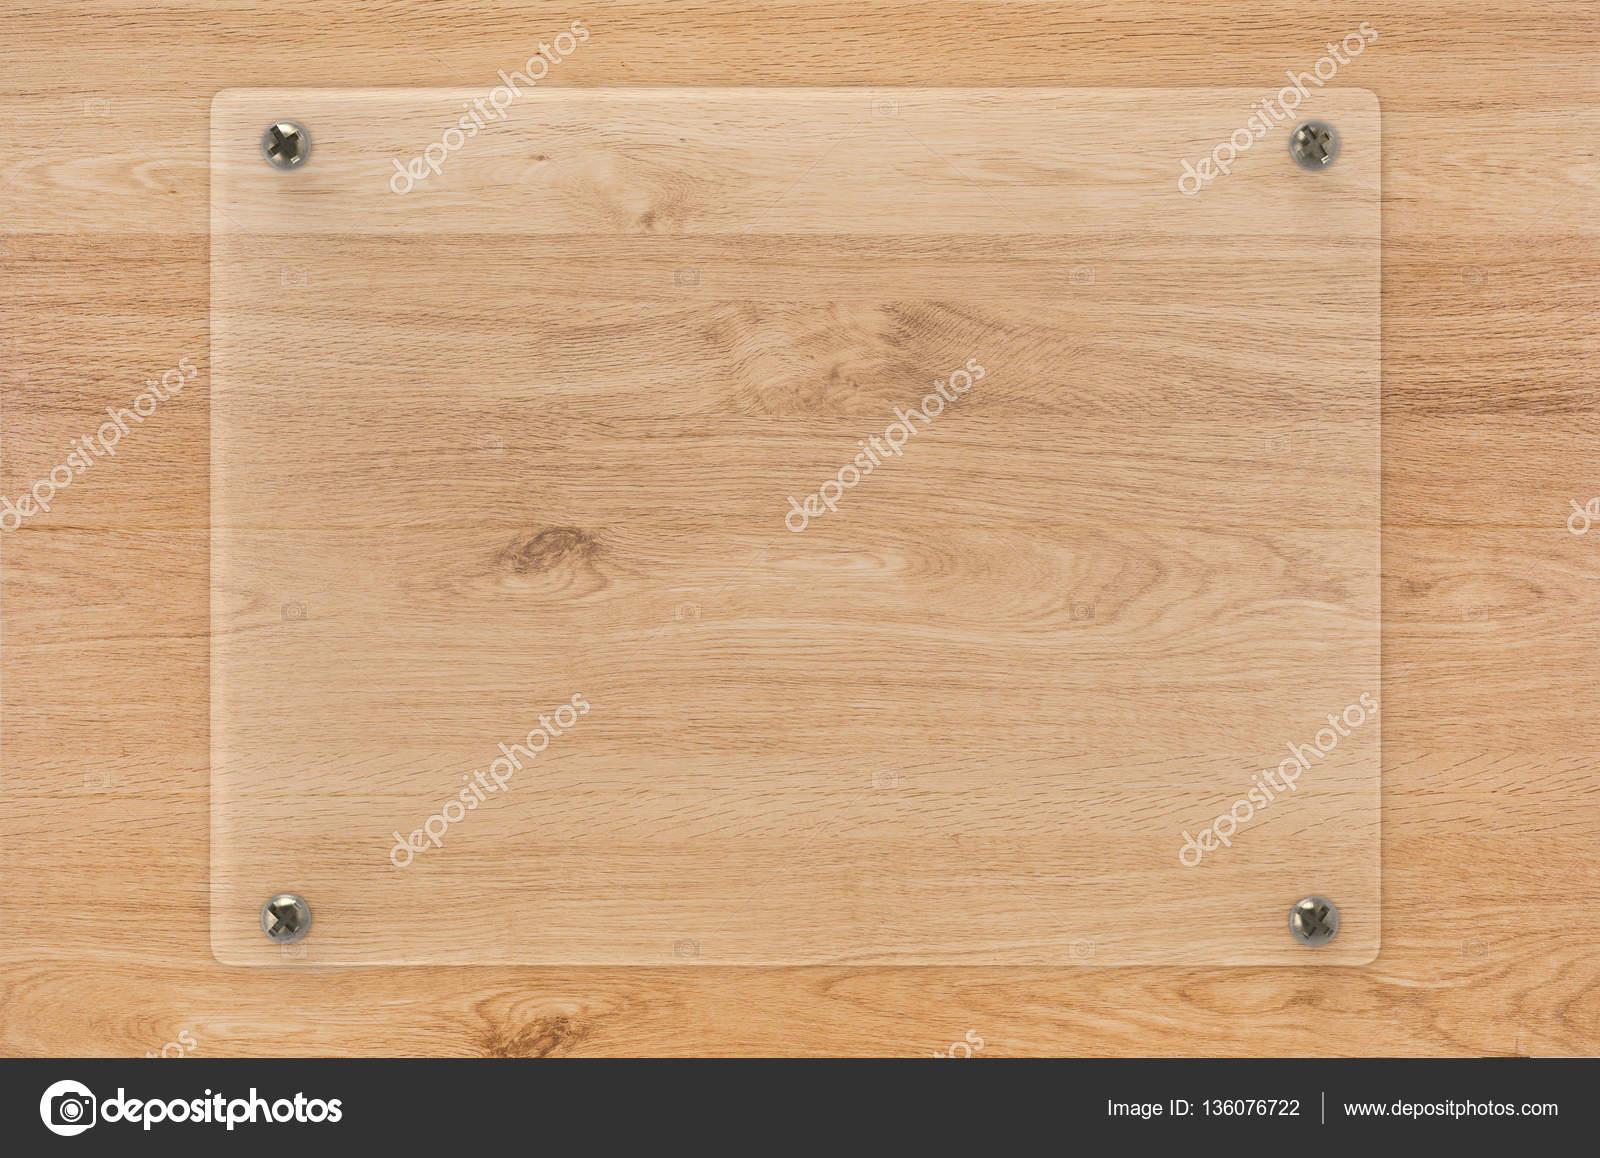 marco de tablero o acrílico de cristal sobre fondo de madera — Foto ...